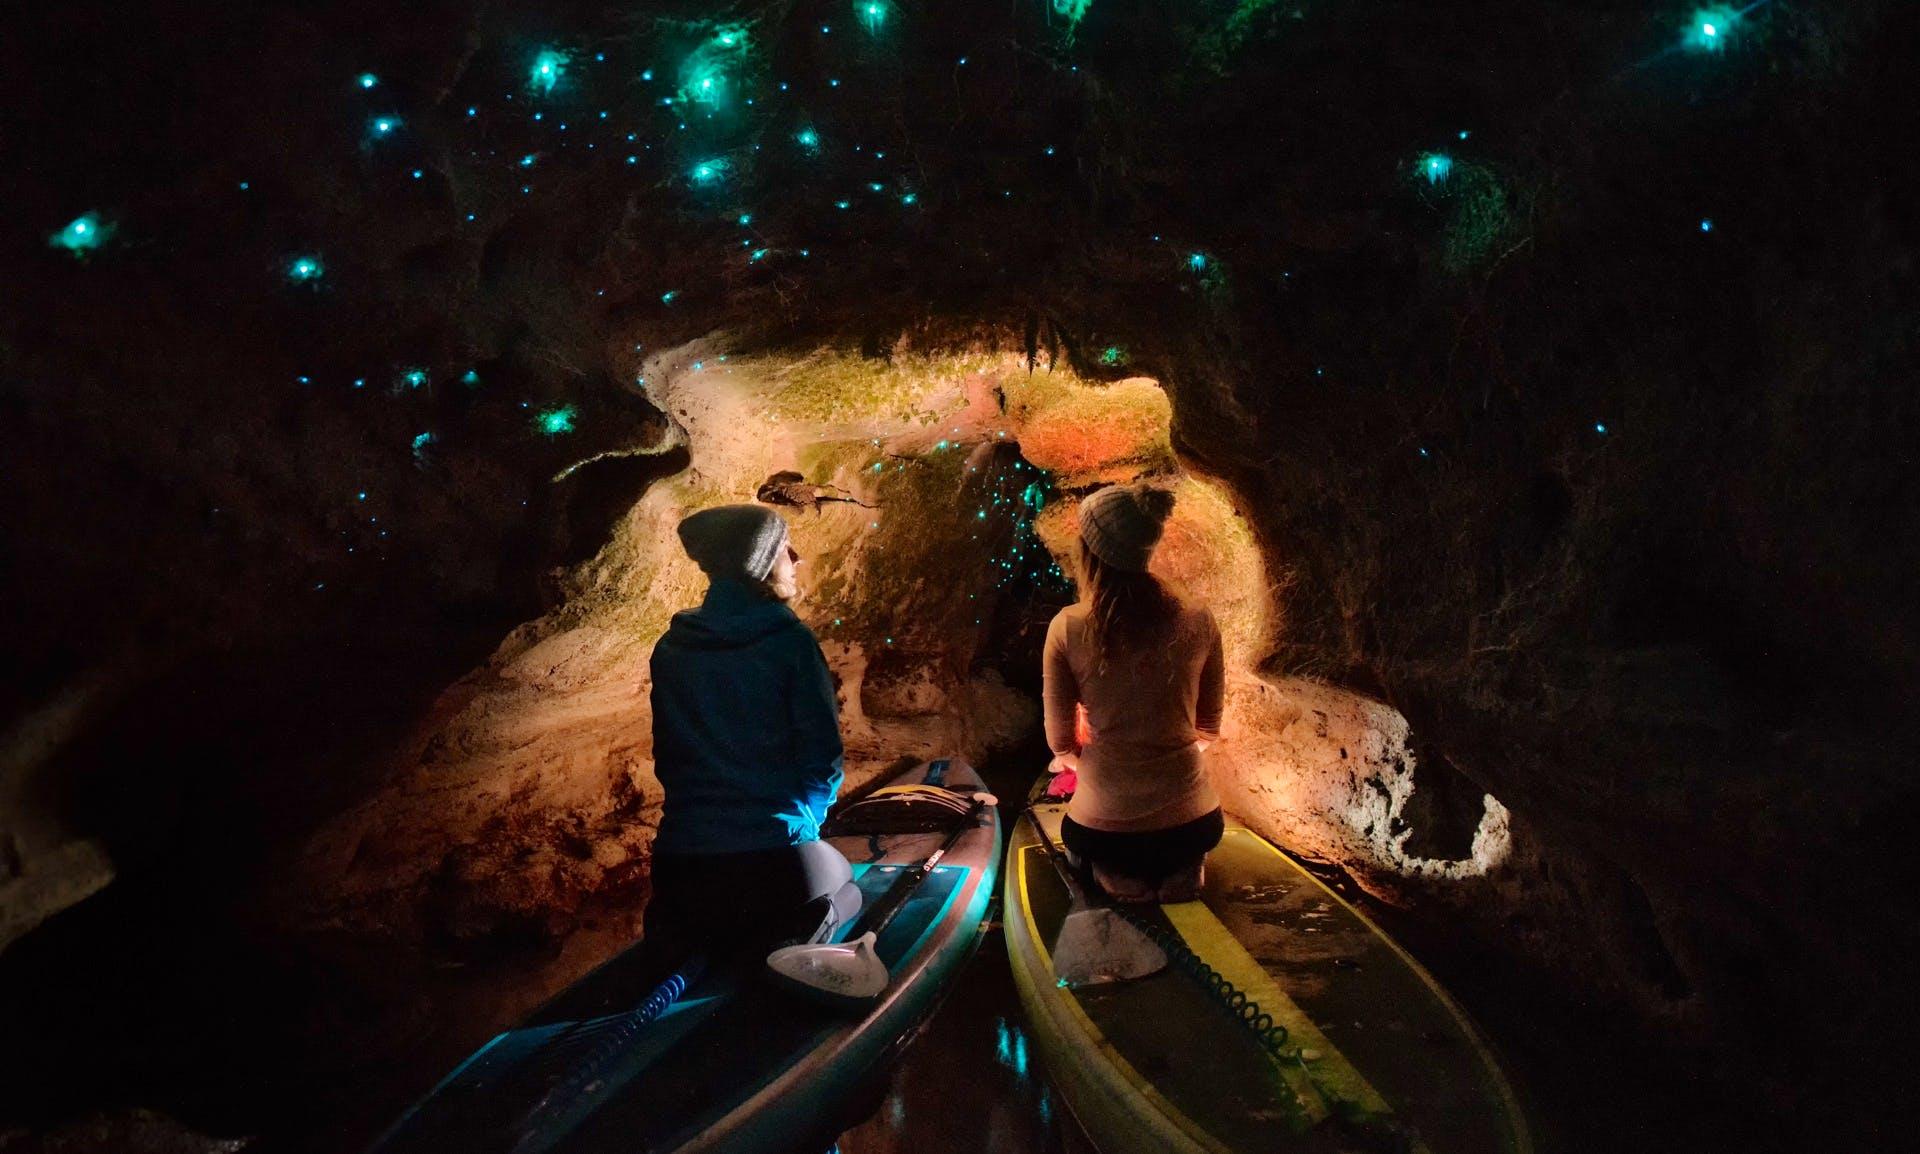 Paddle Board Glow Worm Tour